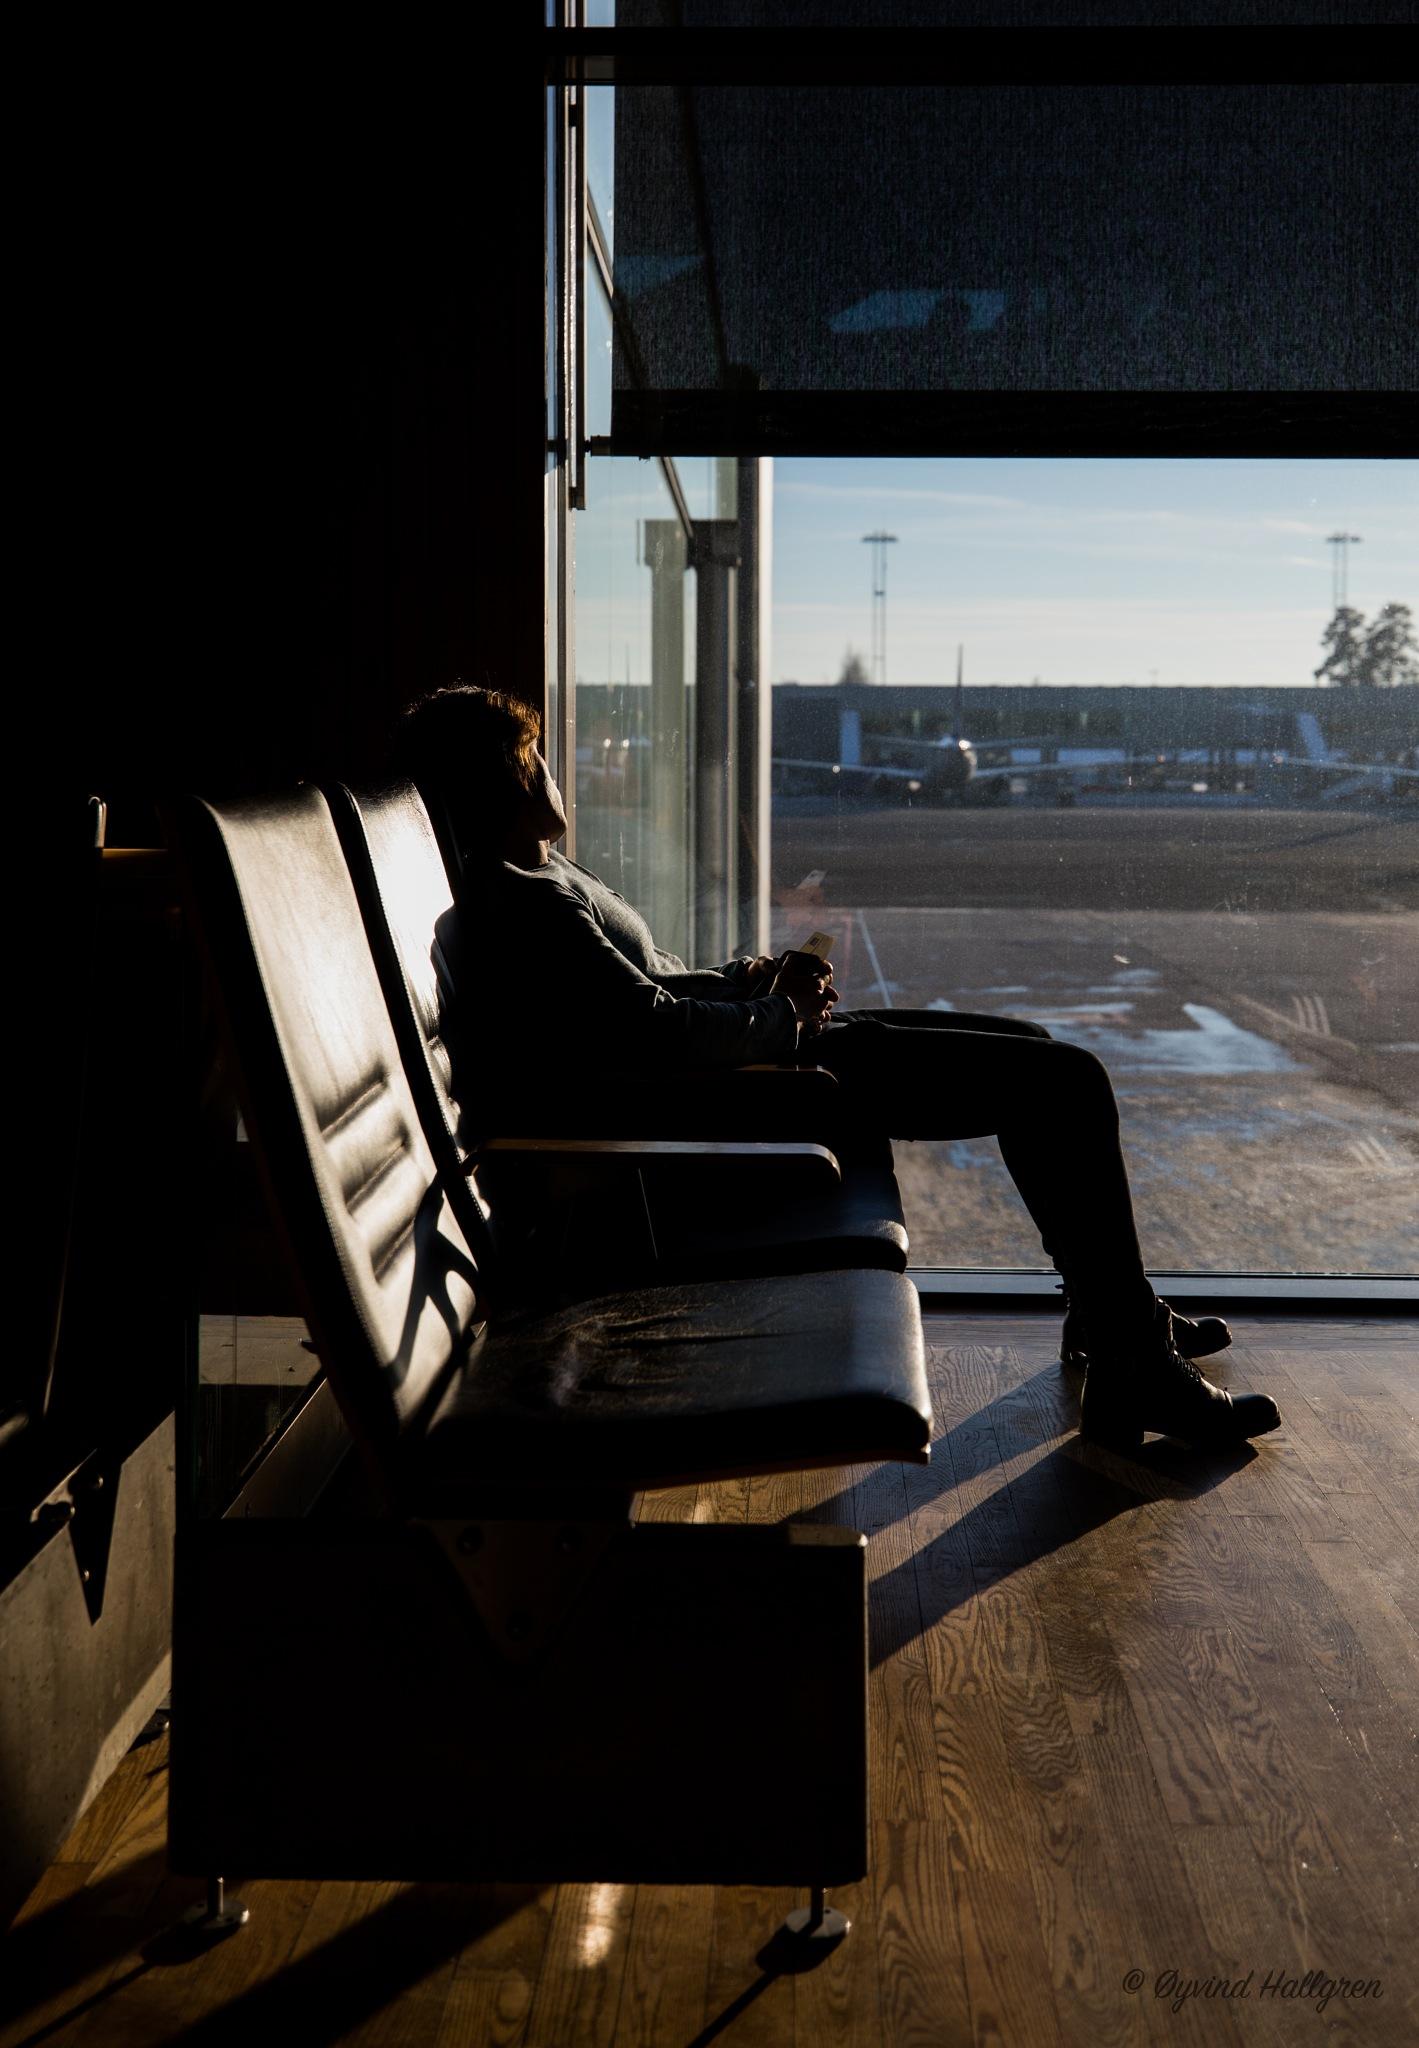 Airport waiting II by Hallgren